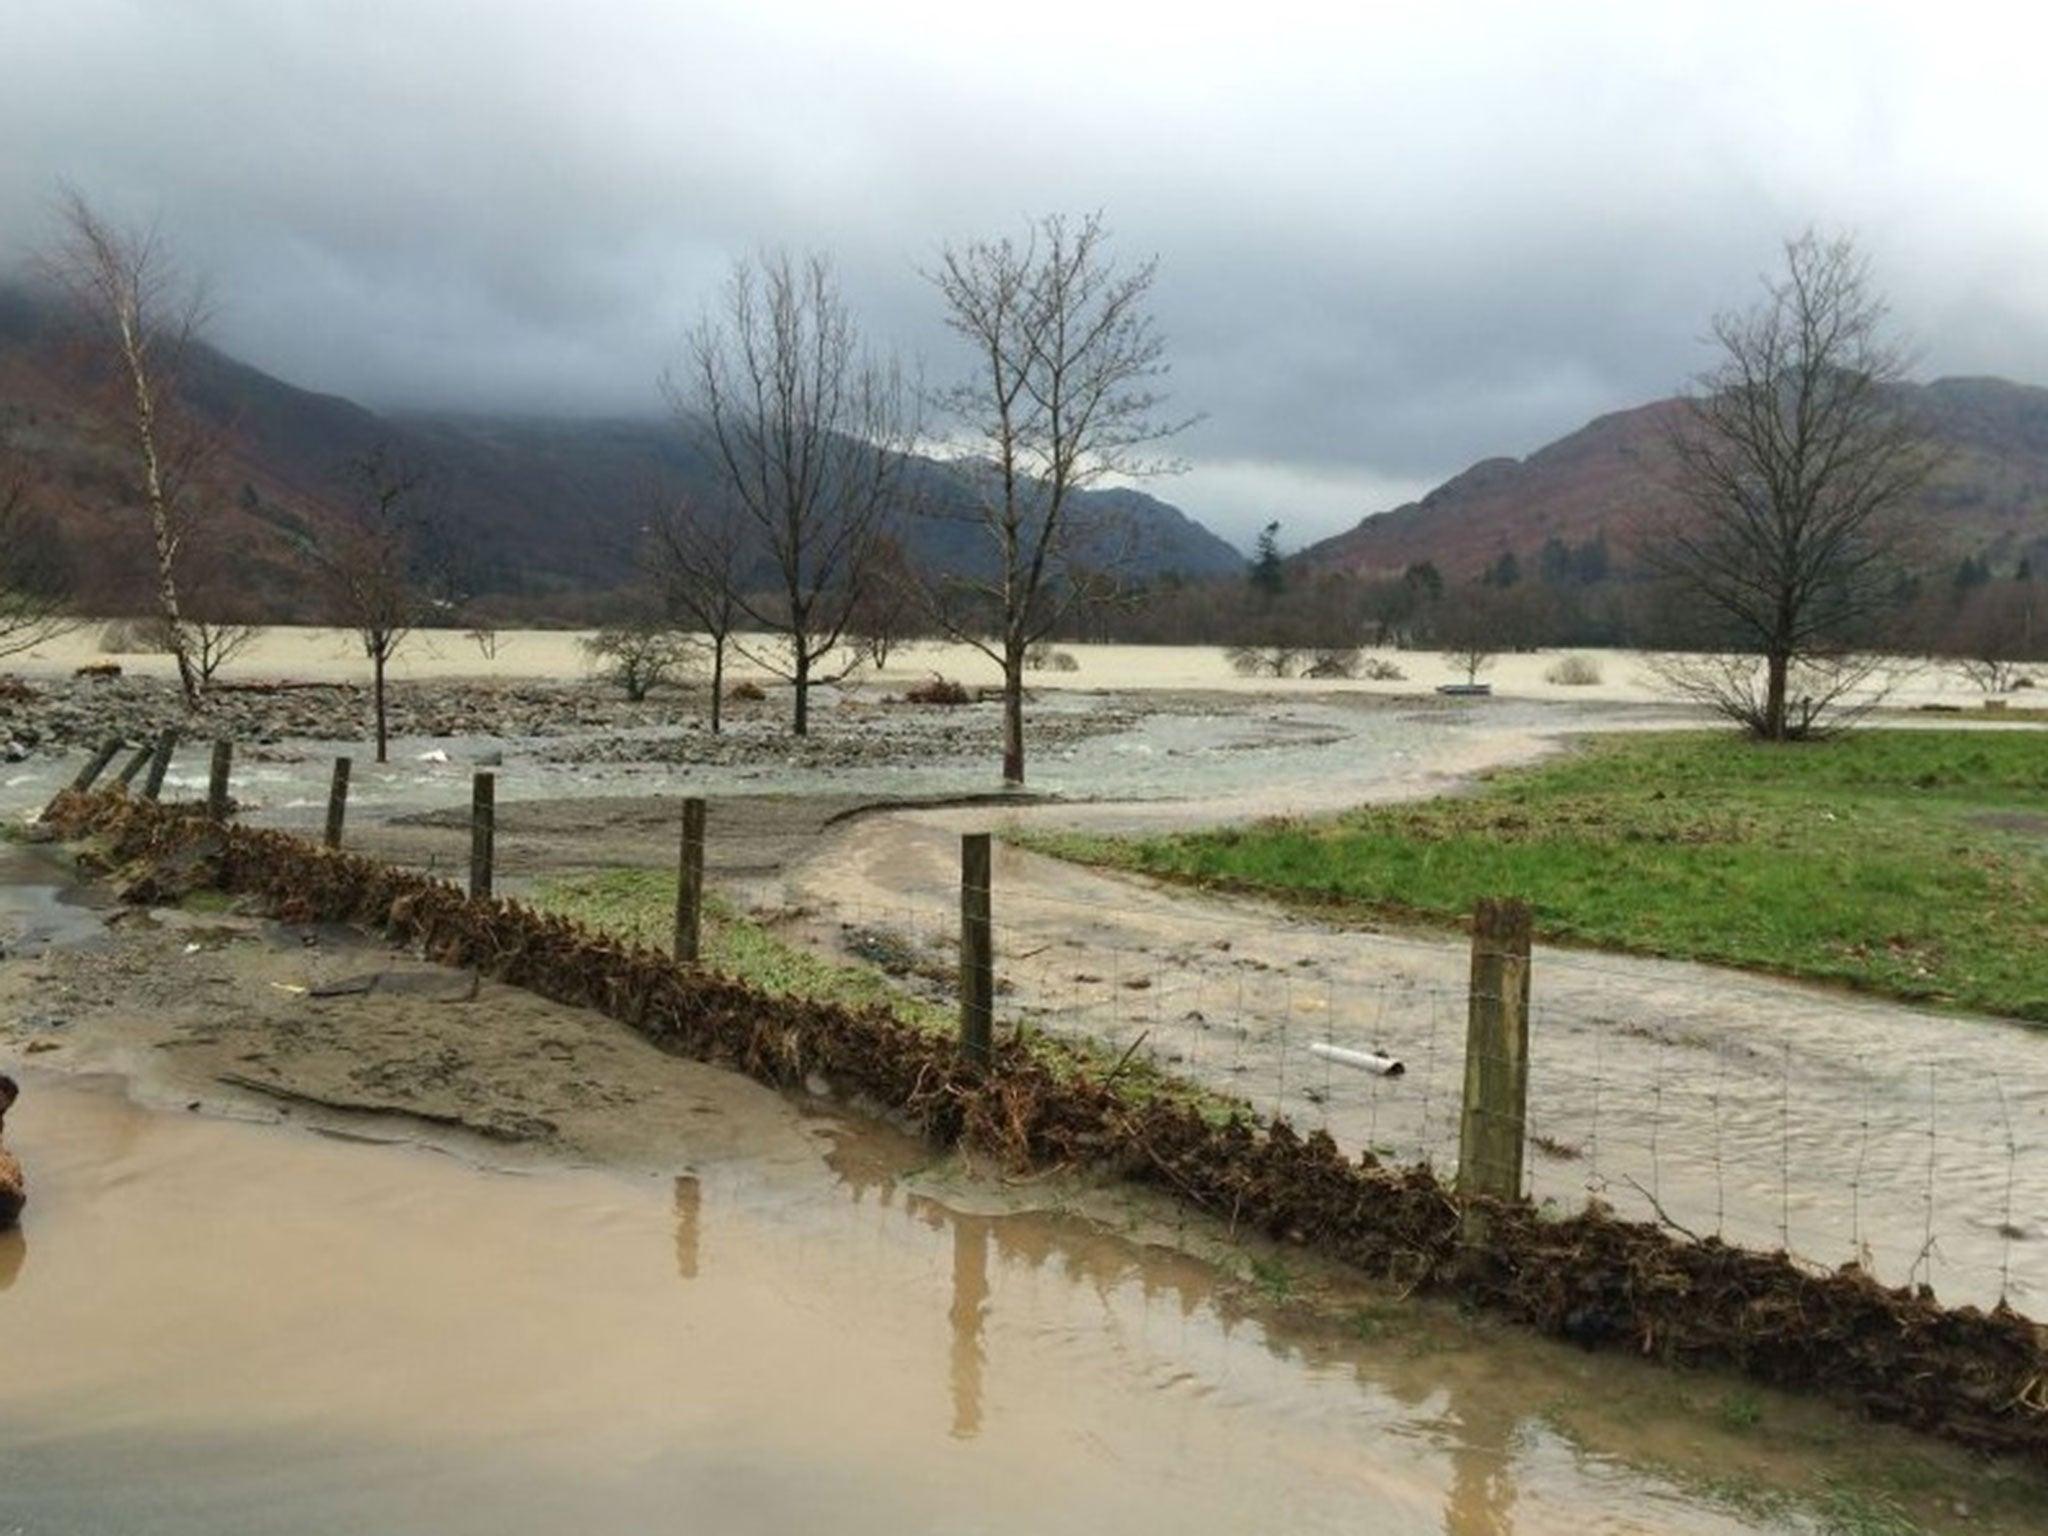 cumbria flood bride battles - HD2048×1152